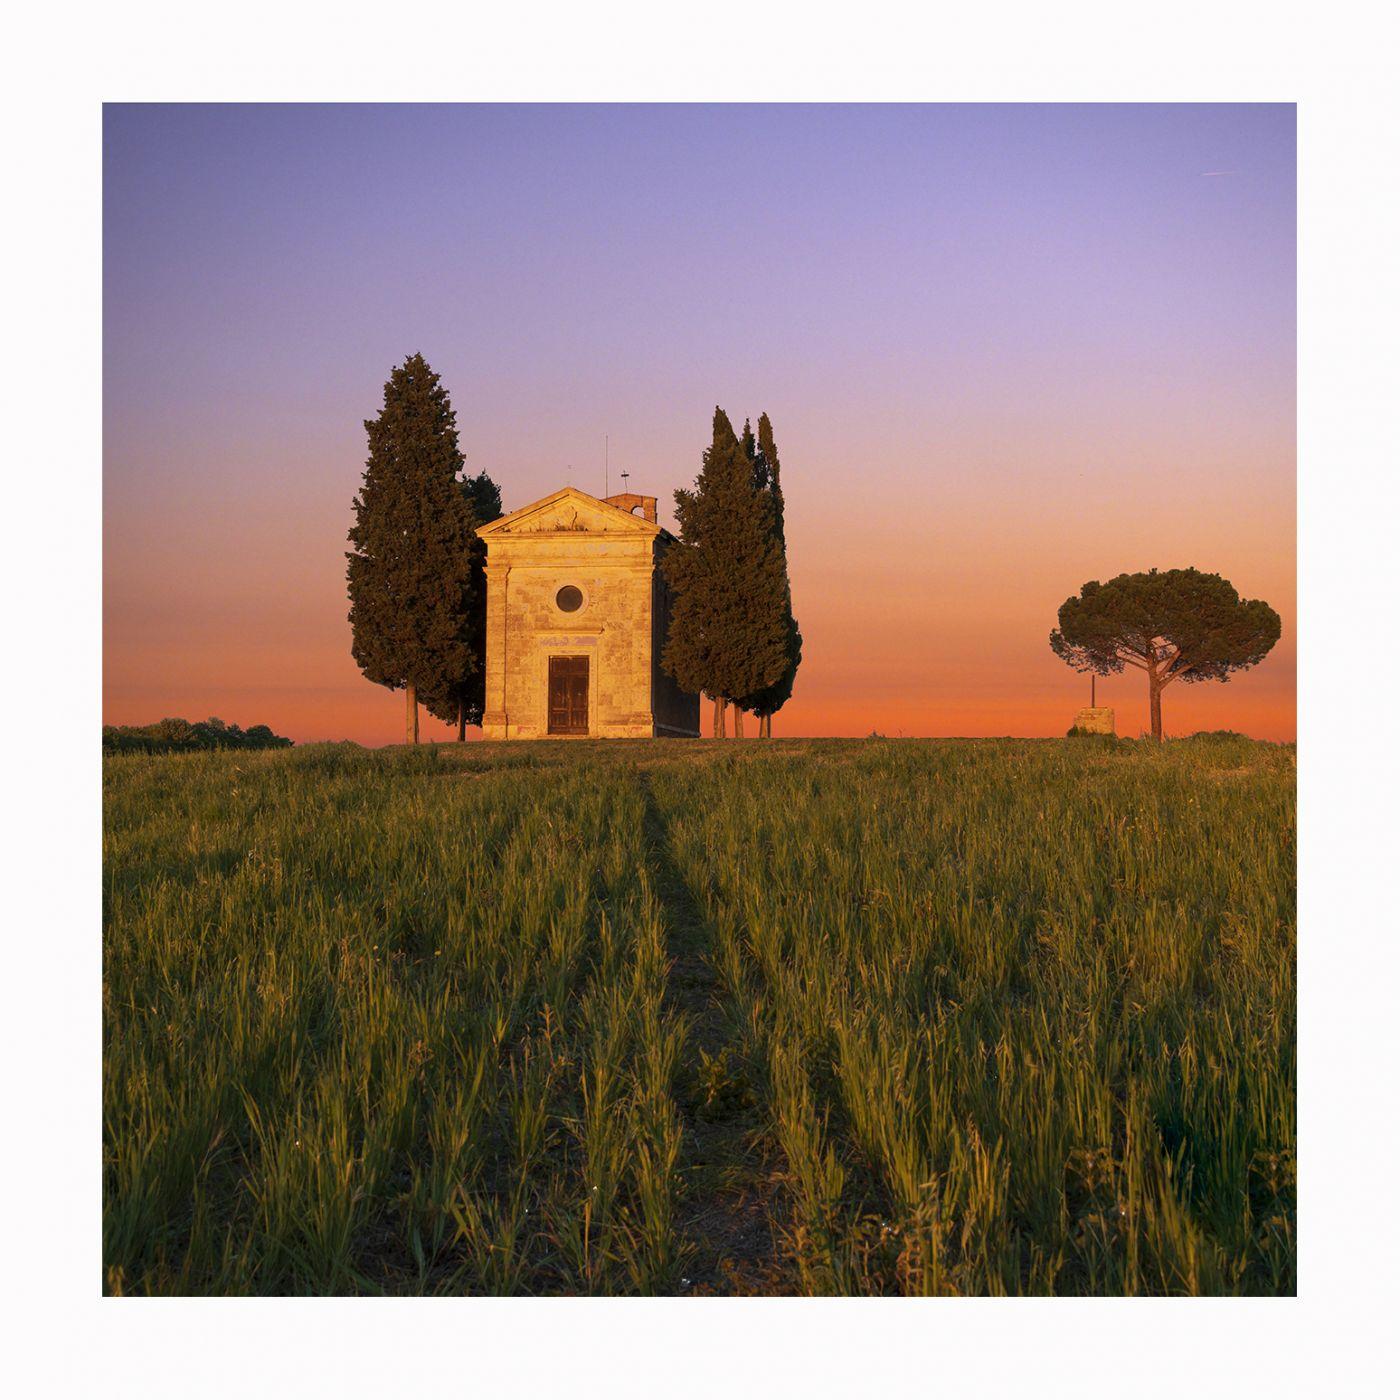 Cappella Madonna di Vitaleta, Italy